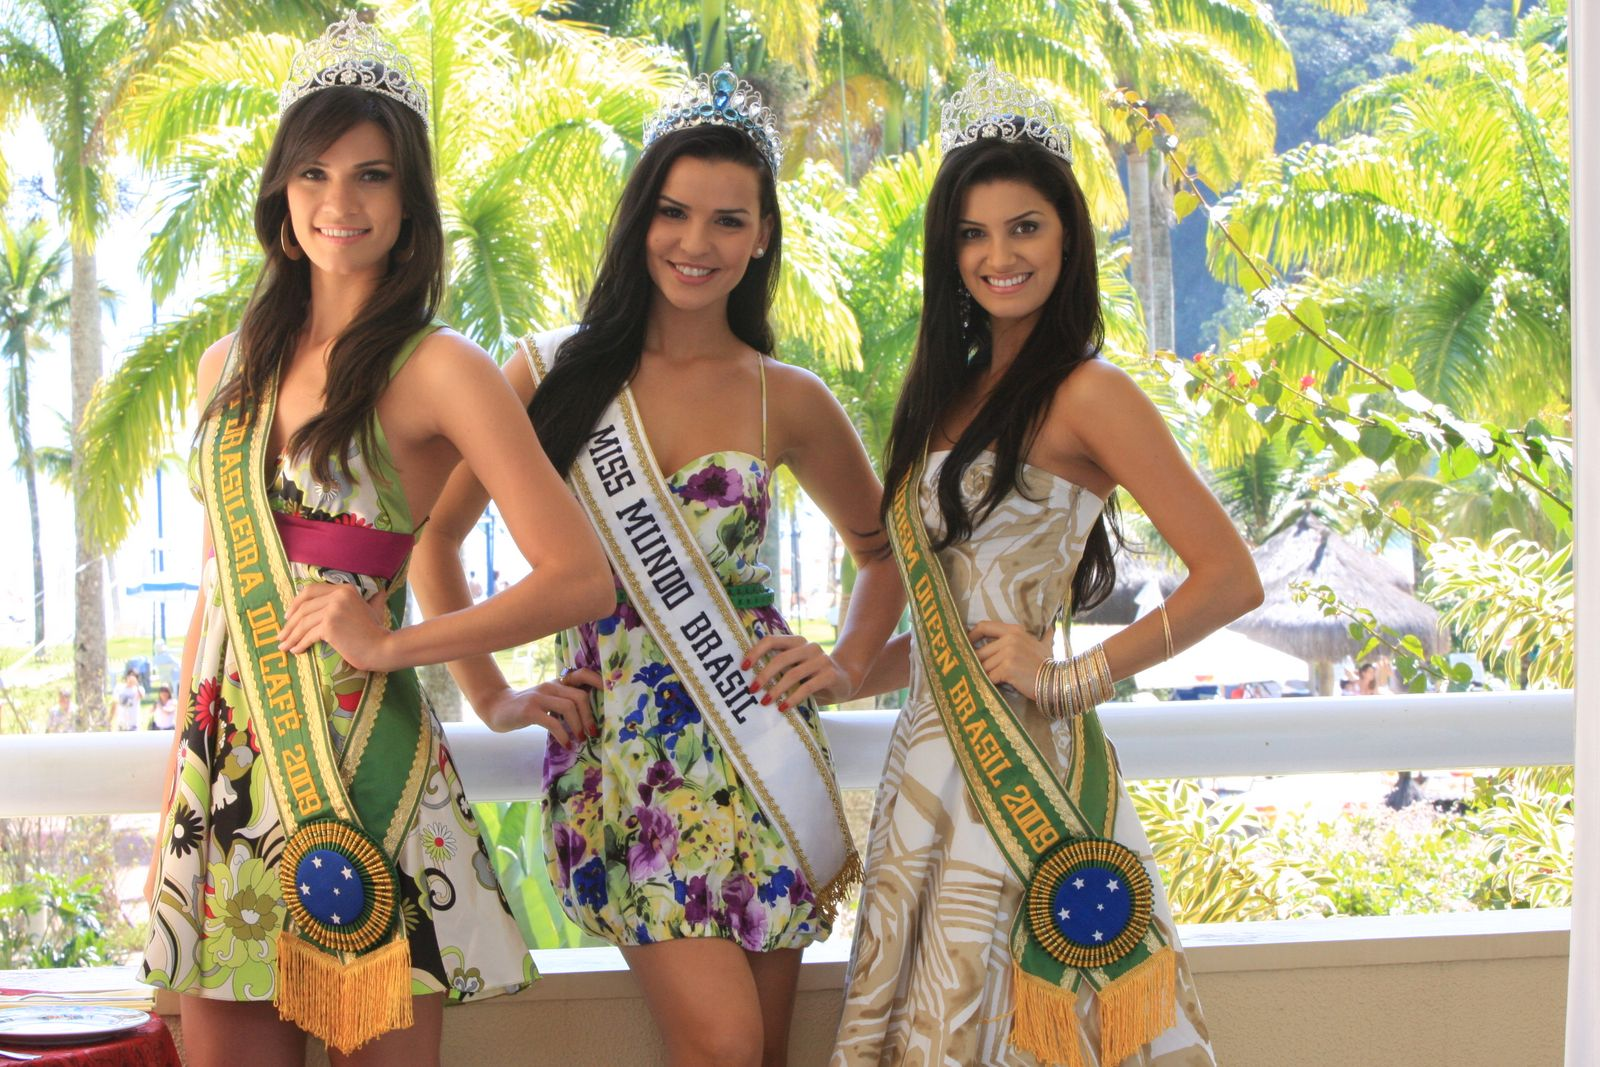 vivian noronha, rainha hispanoamericana 2008. suplente. - Página 2 Wo7vjb5a